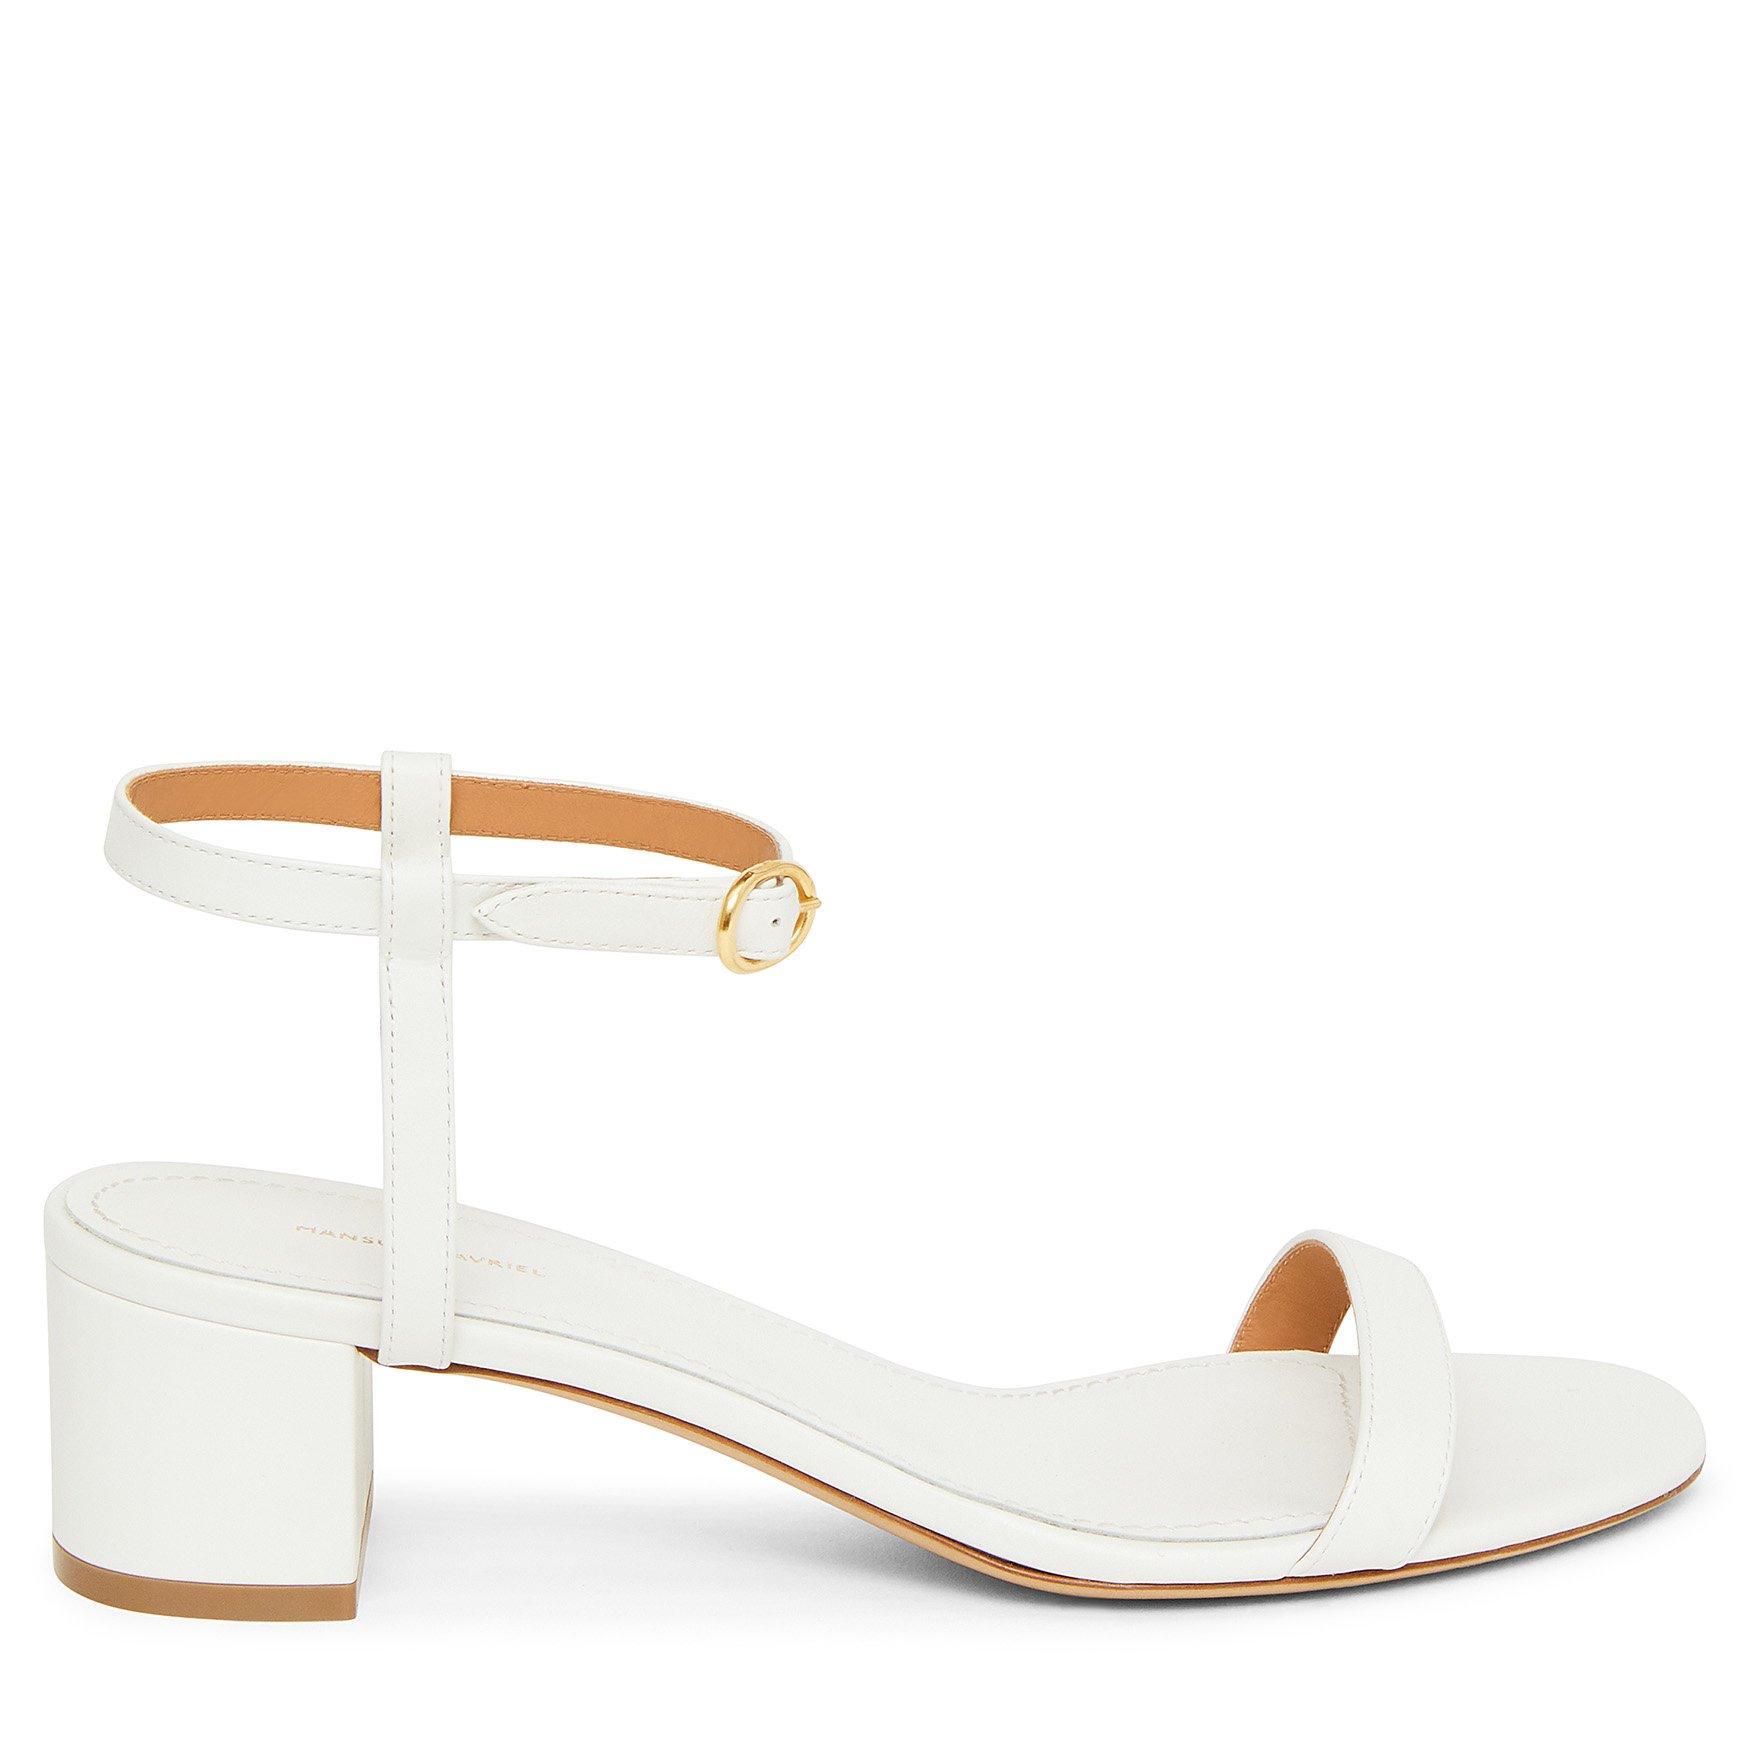 71152aa62500 Lyst - Mansur Gavriel Lamb Ankle Strap Sandal - White in White